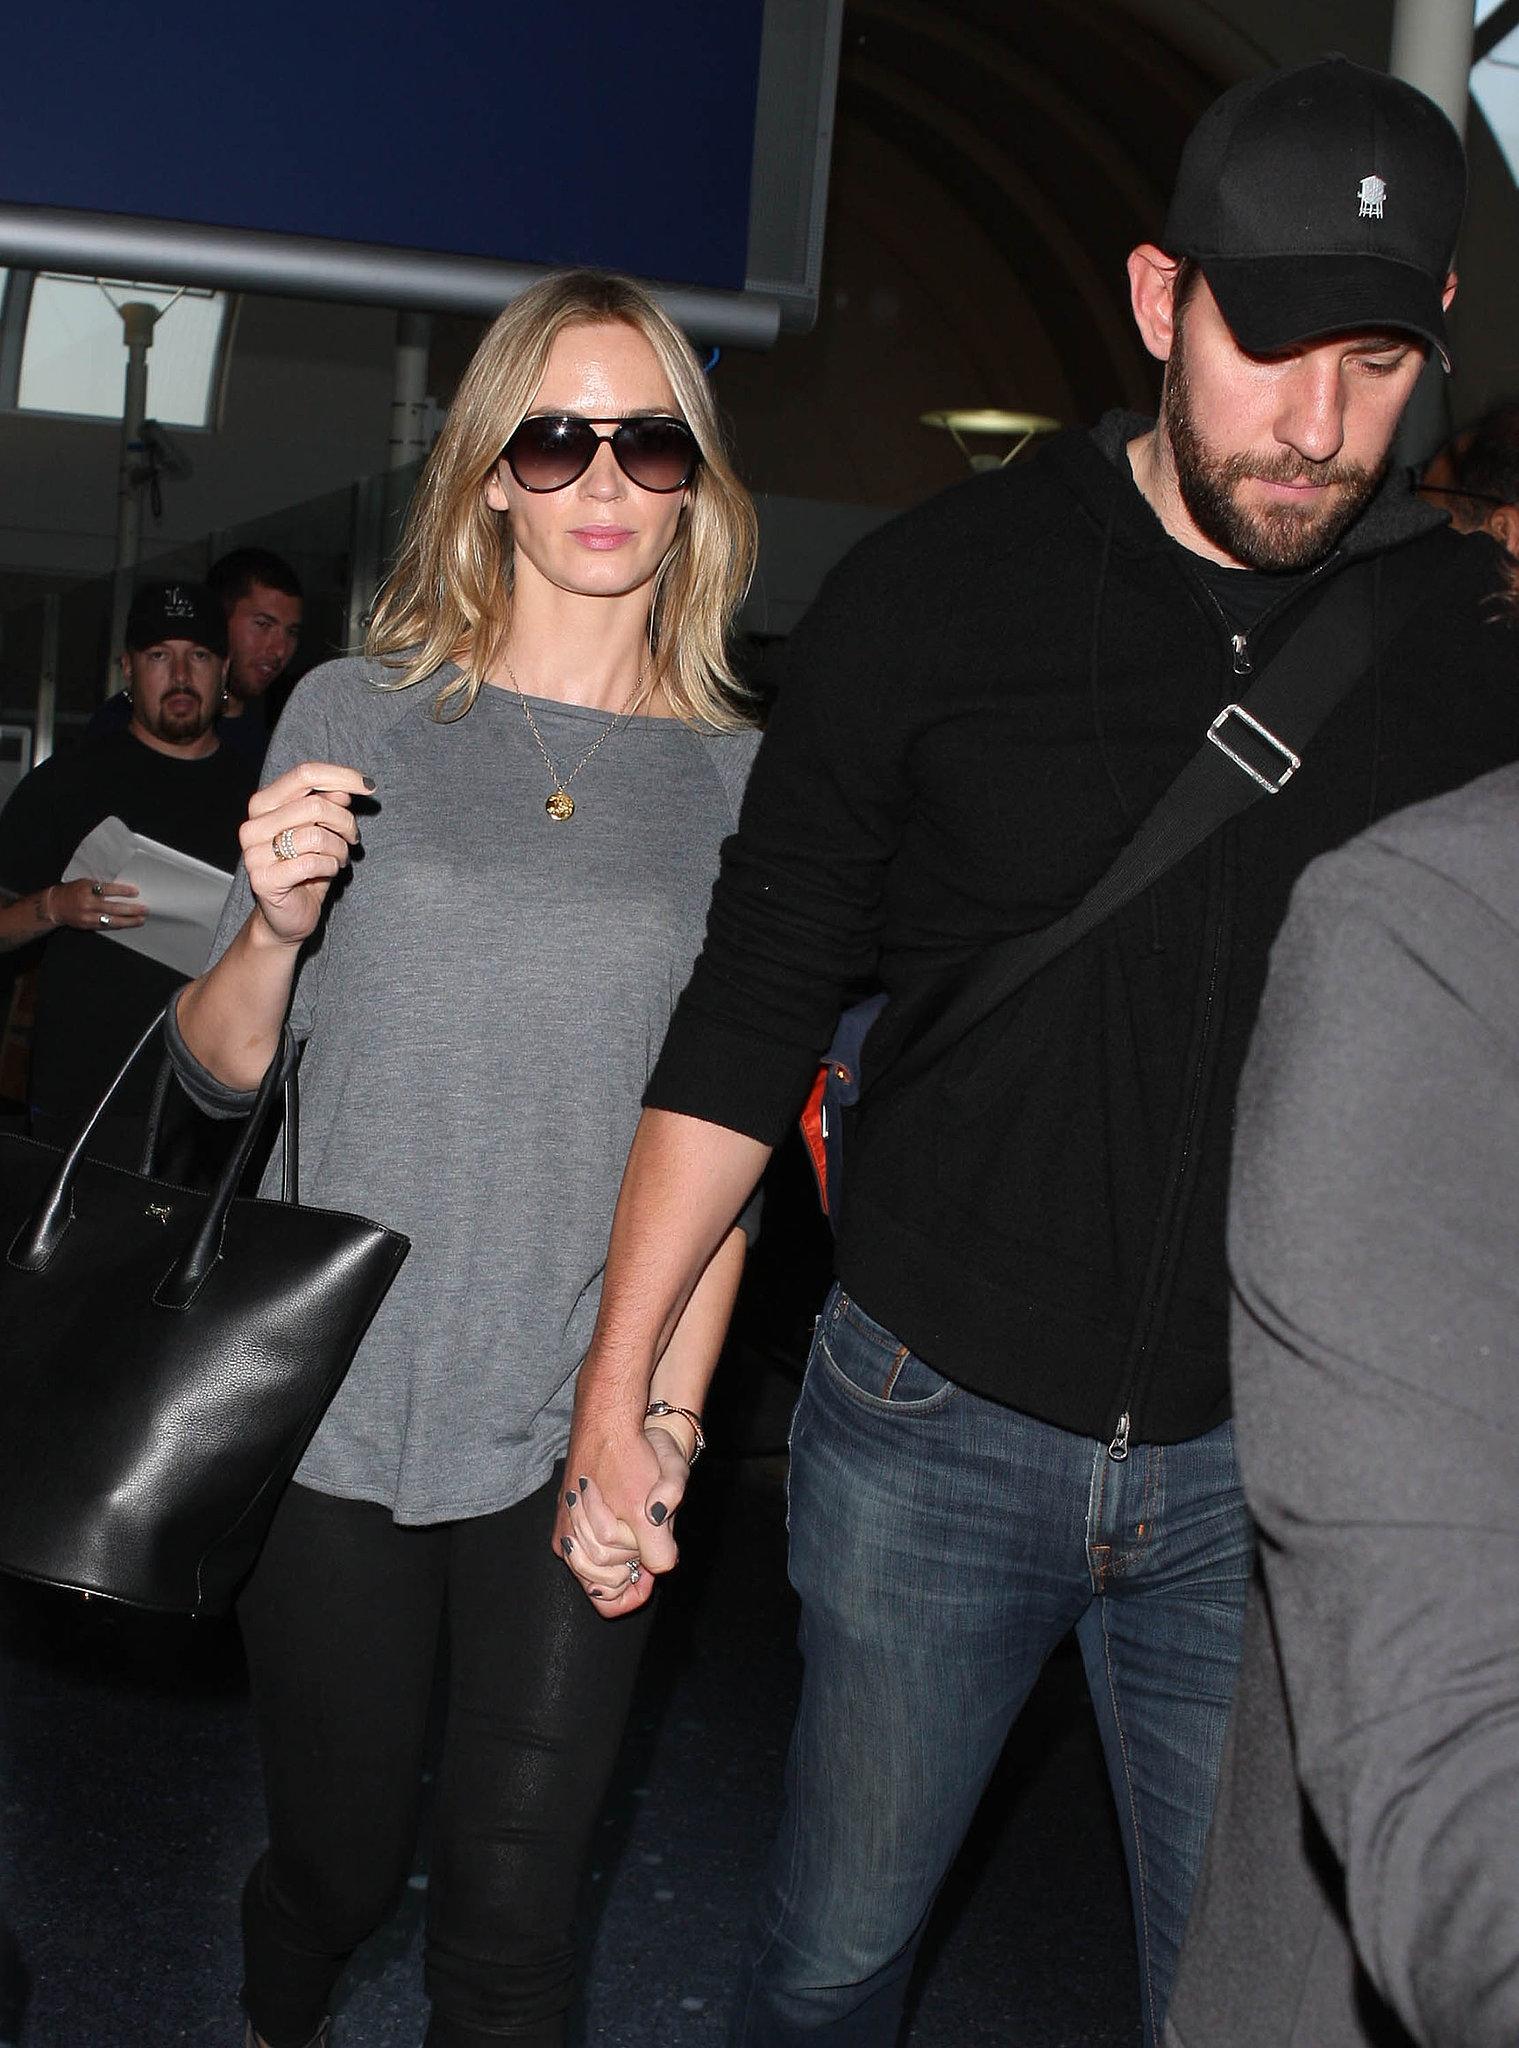 John Krasinski and Emily Blunt arrived at LAX holding hands.